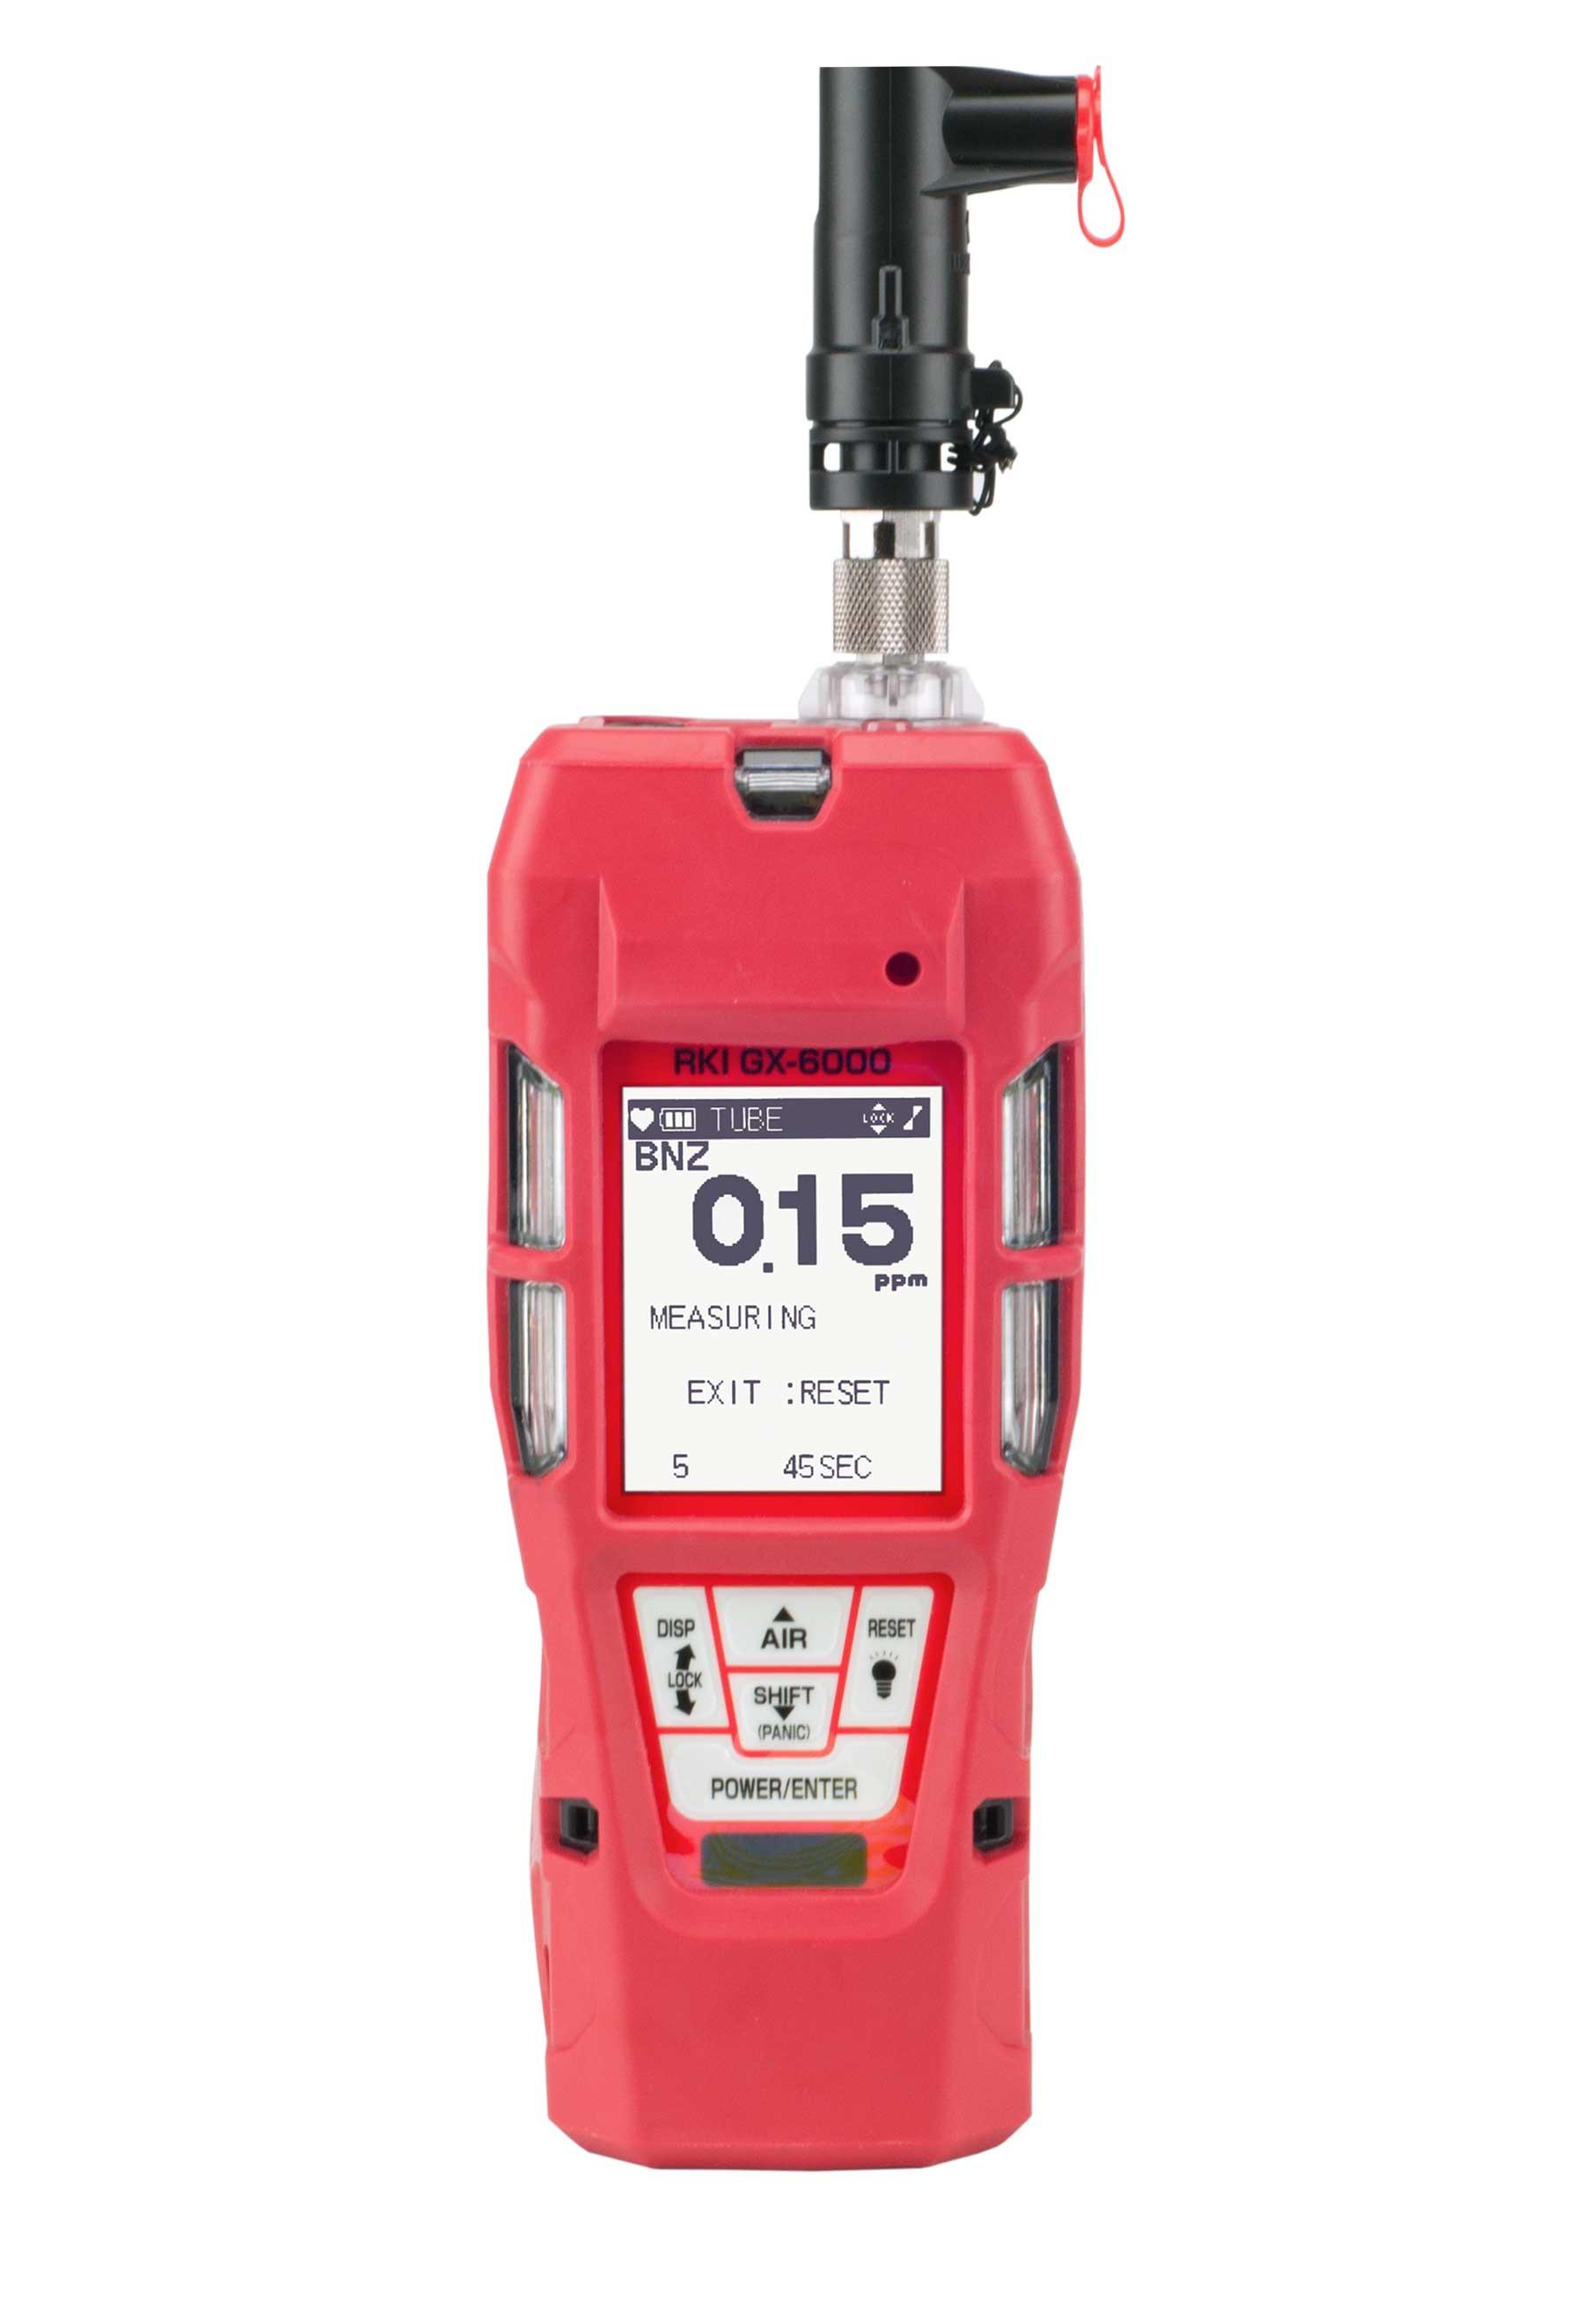 GX-6000 Benzene Gas Detector